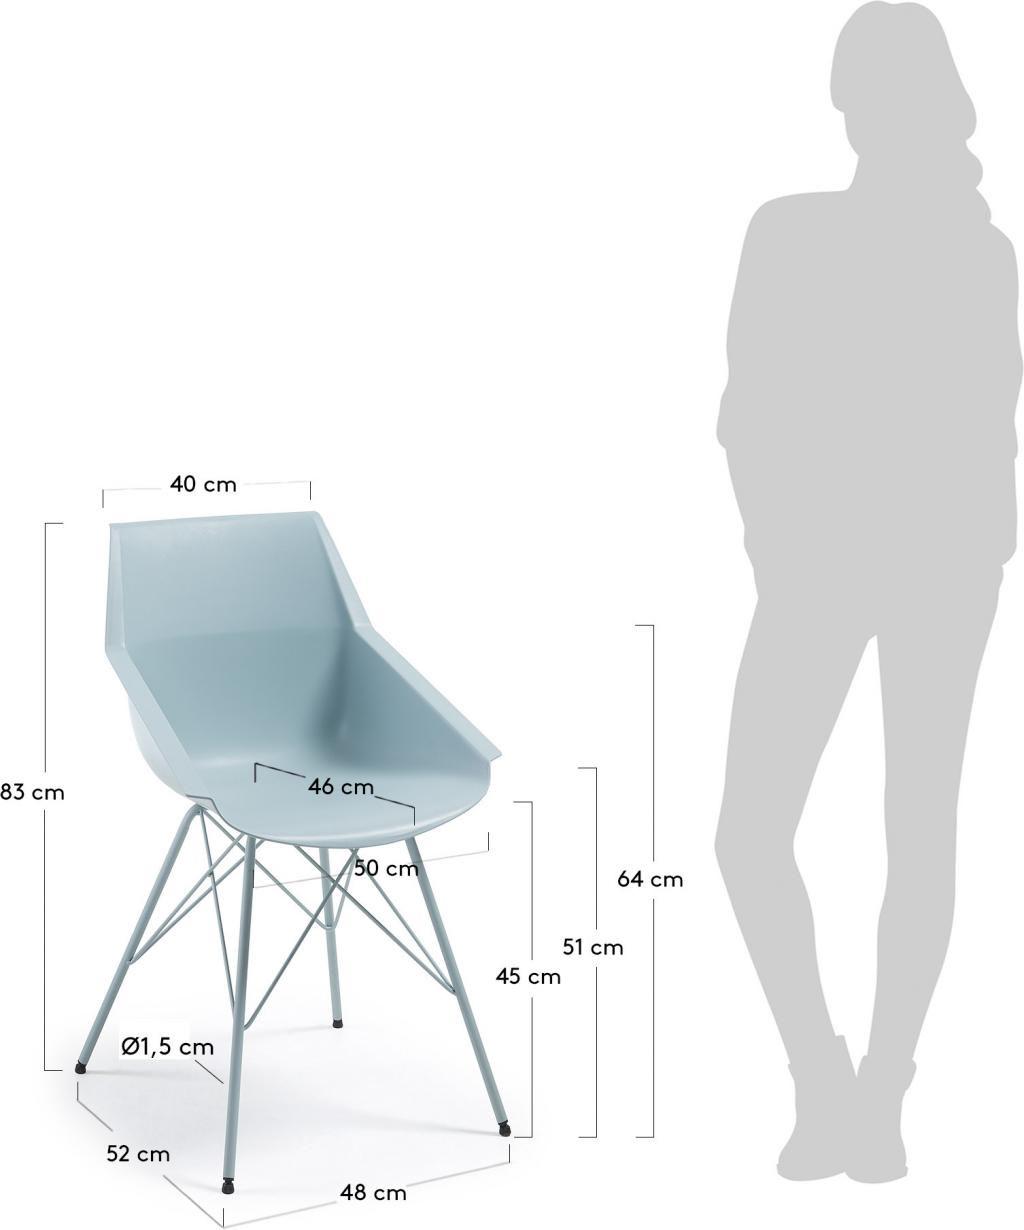 esszimmerstuhl kunn hellblau epoxy kunststoff schale la forma kaufen. Black Bedroom Furniture Sets. Home Design Ideas